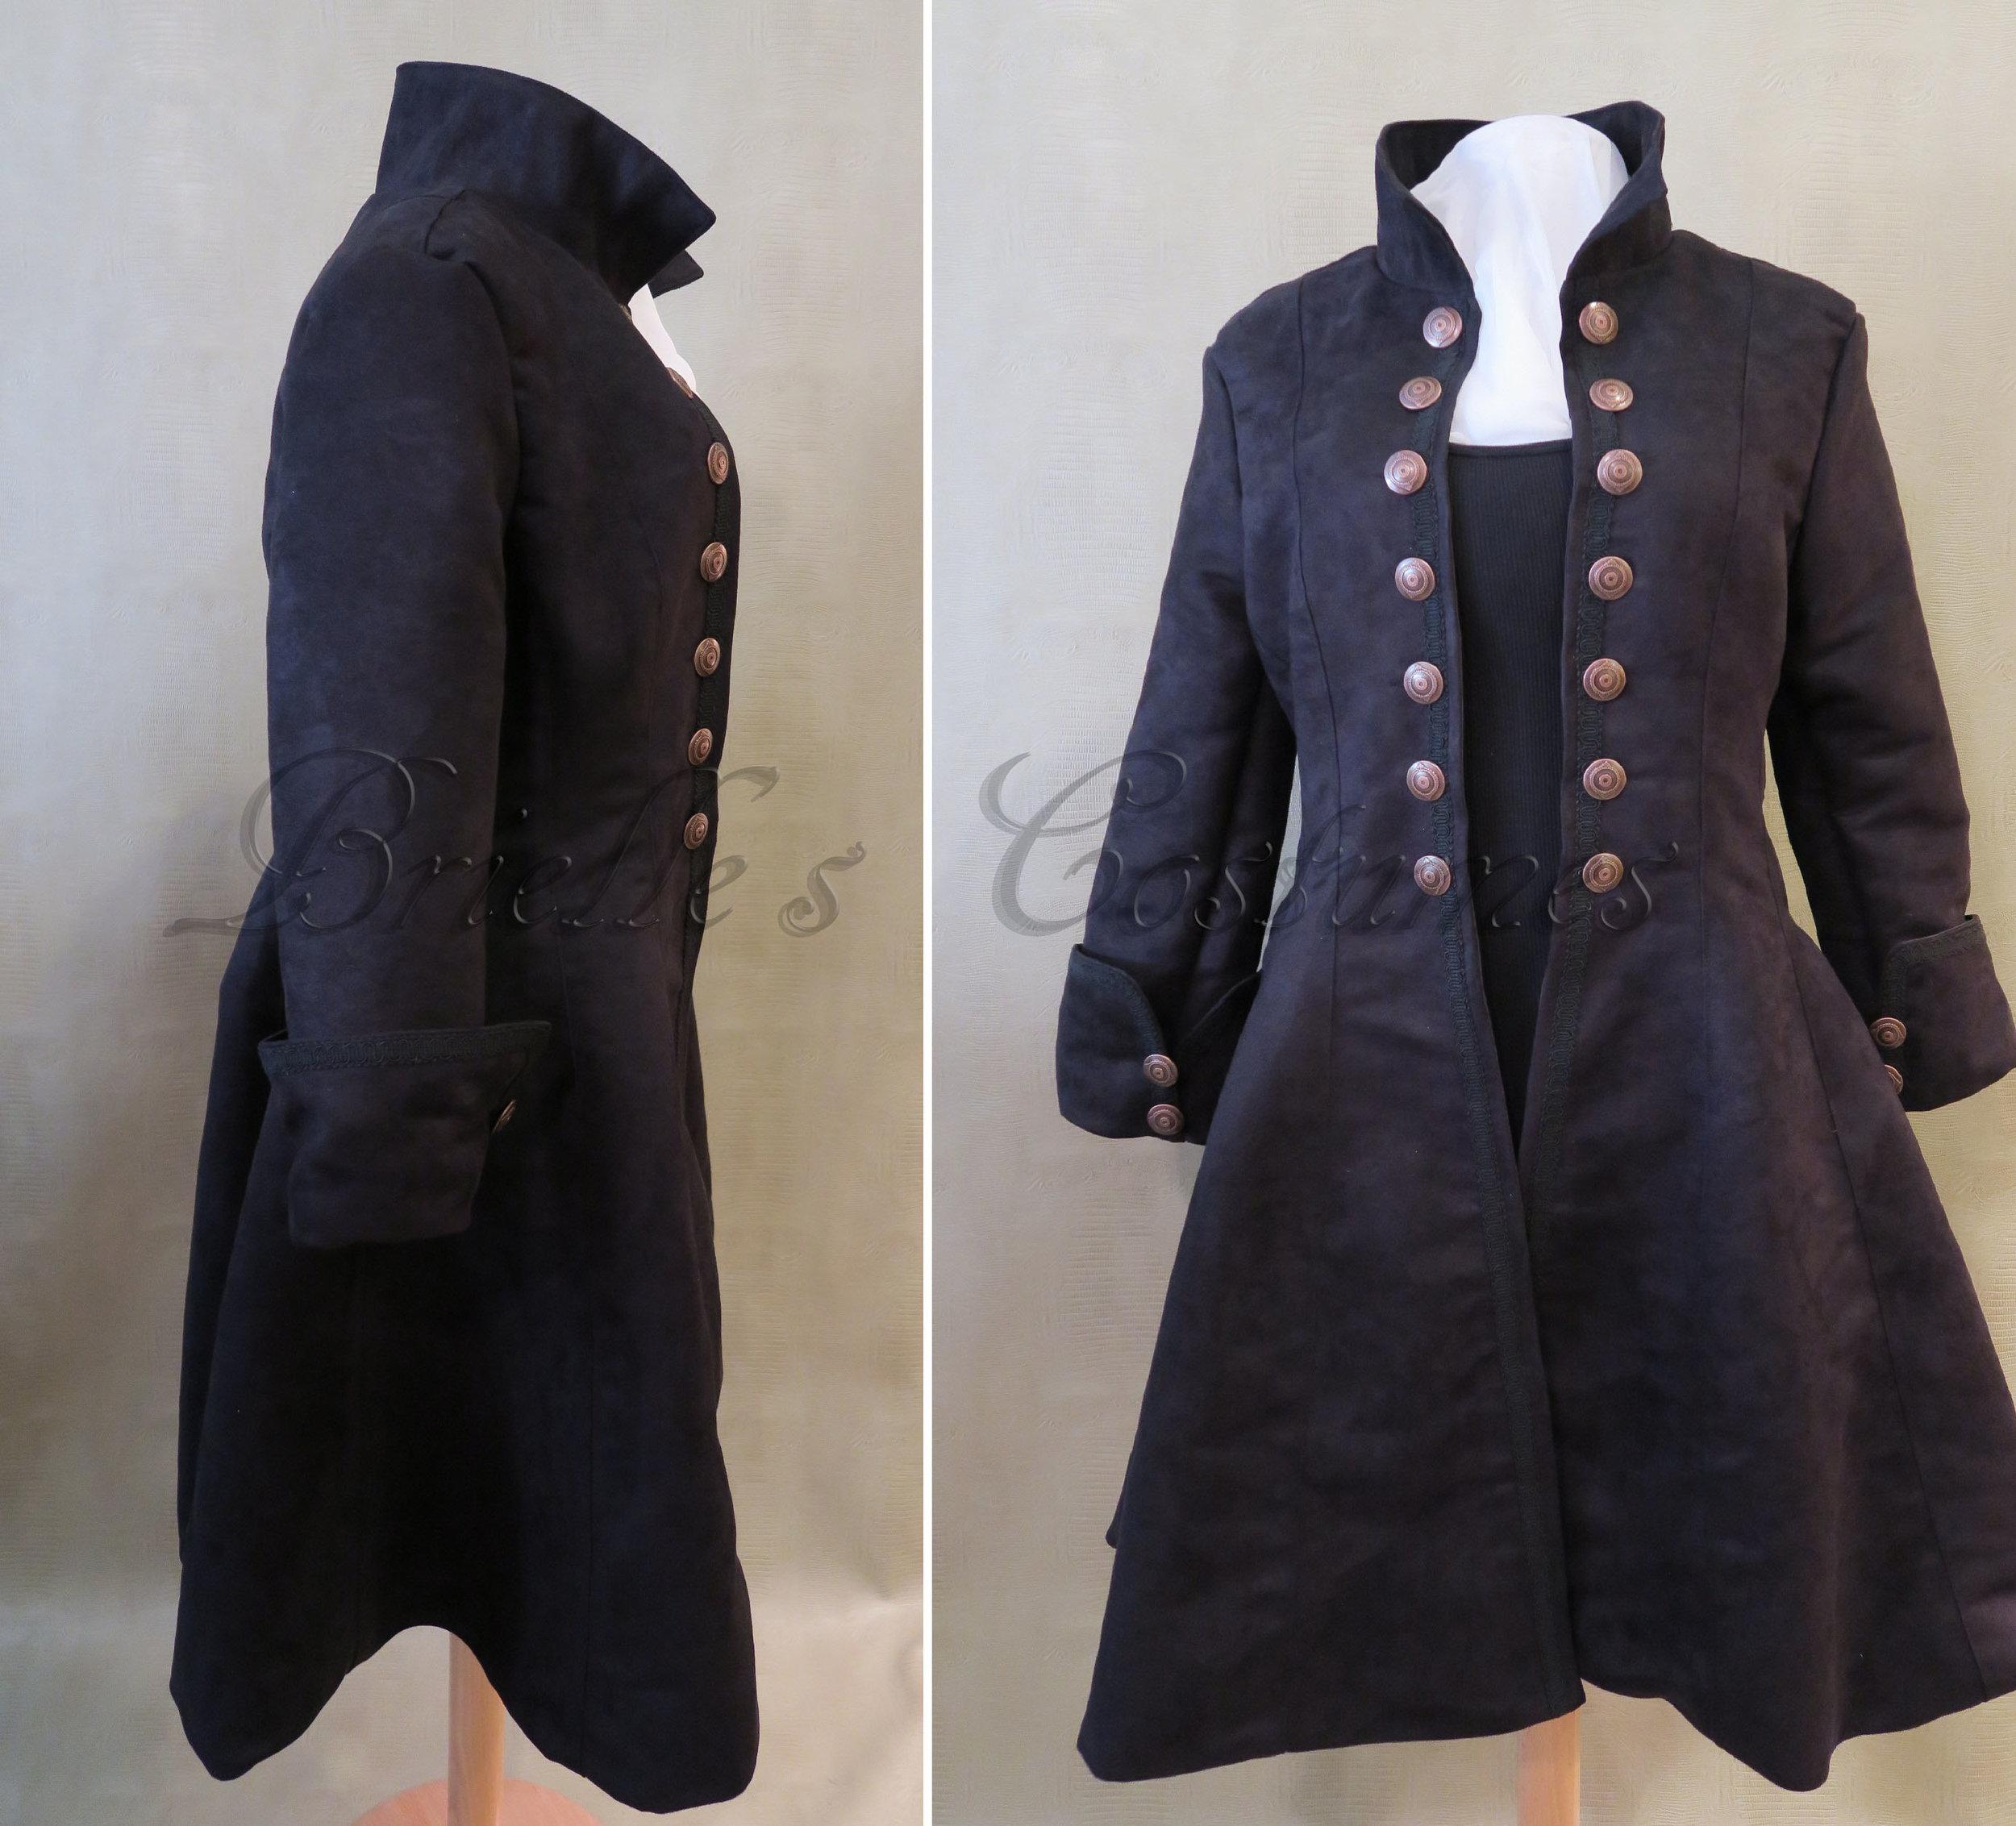 Pirate Coat 3.JPG